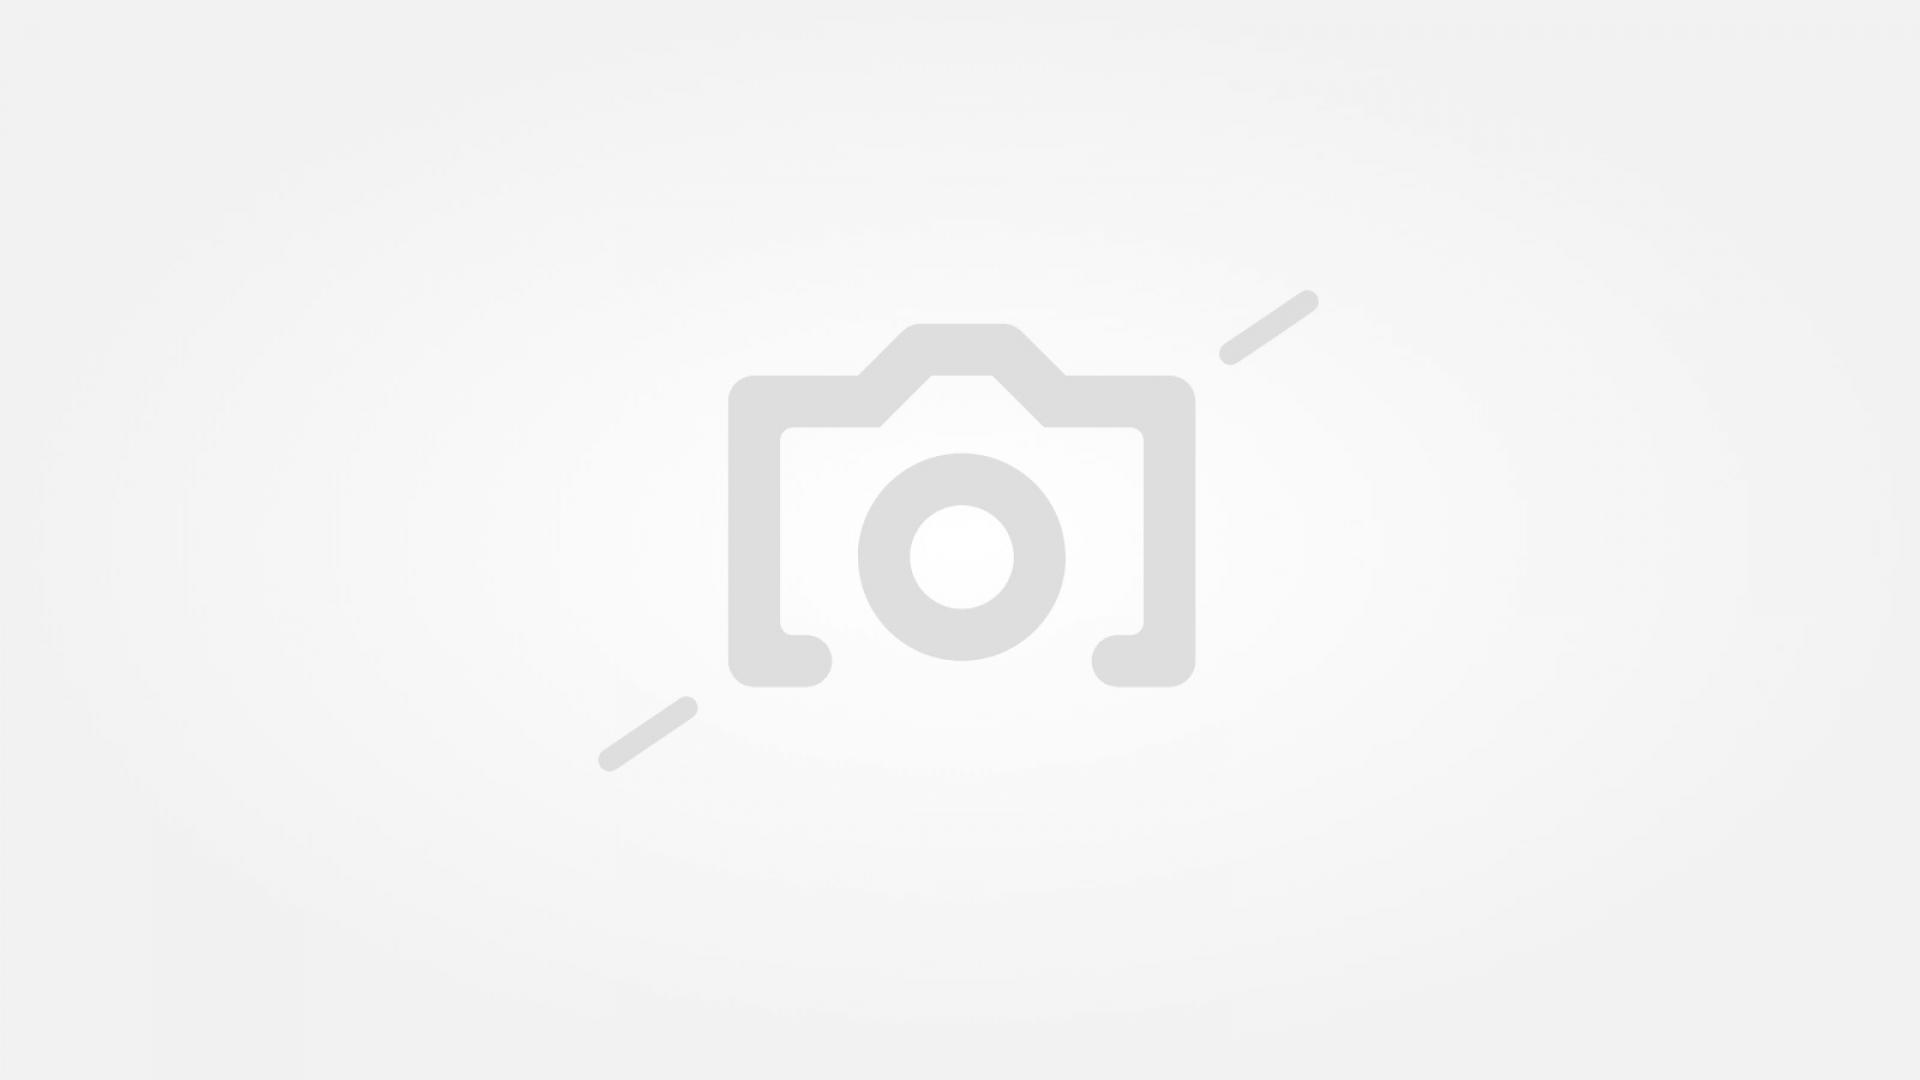 Vesti.bg на 10 години - 10 любопитни факта